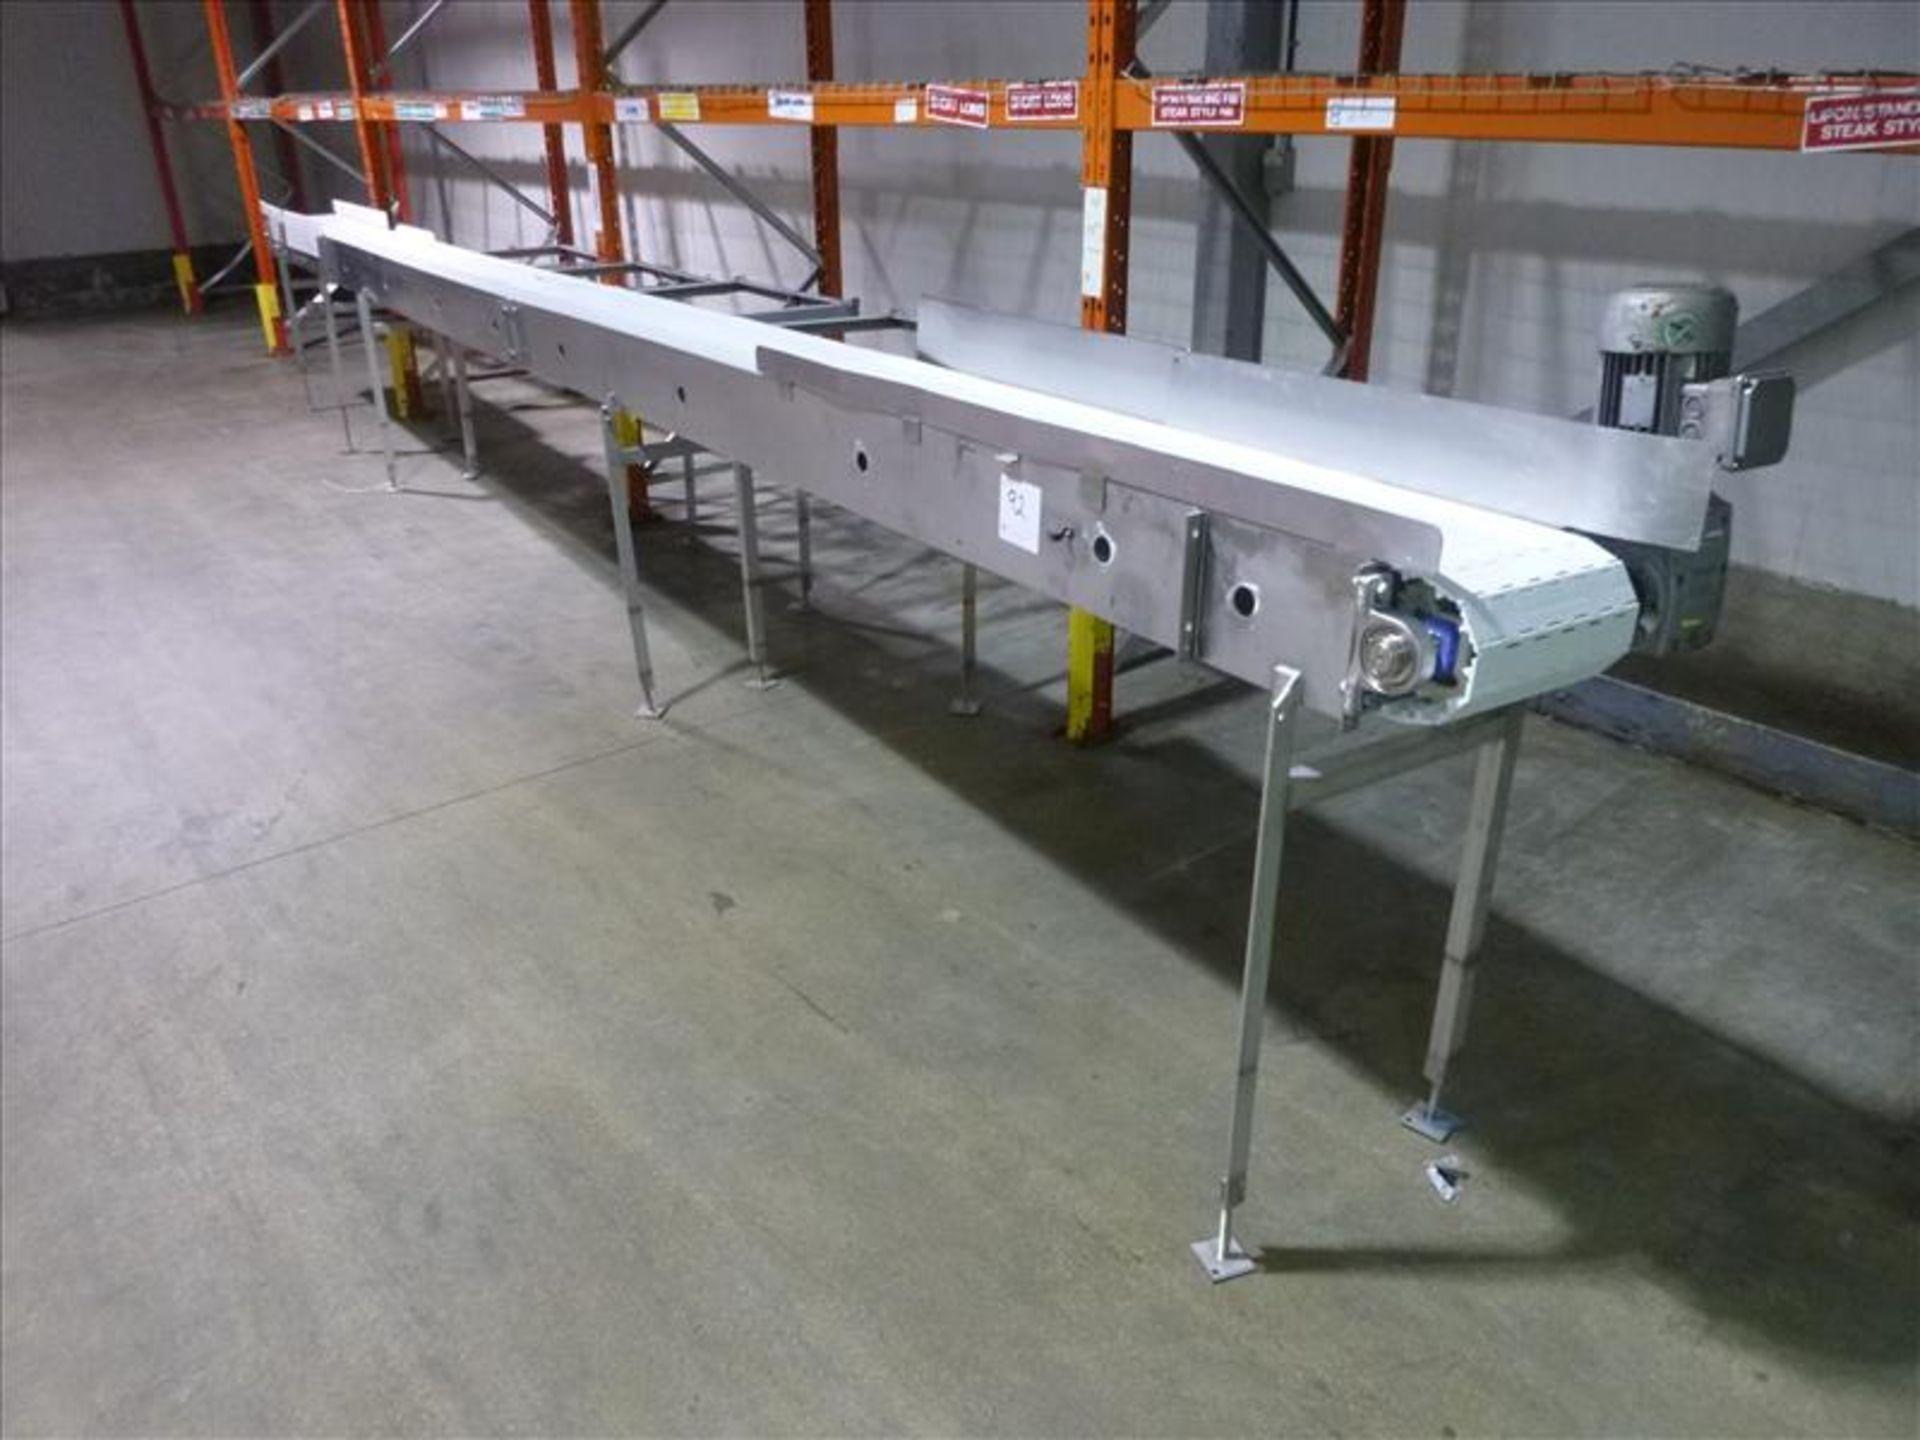 Lot 92 - s/s powered interlox belt conveyor, approx. 12 in. x 26 ft., 1.5 hp